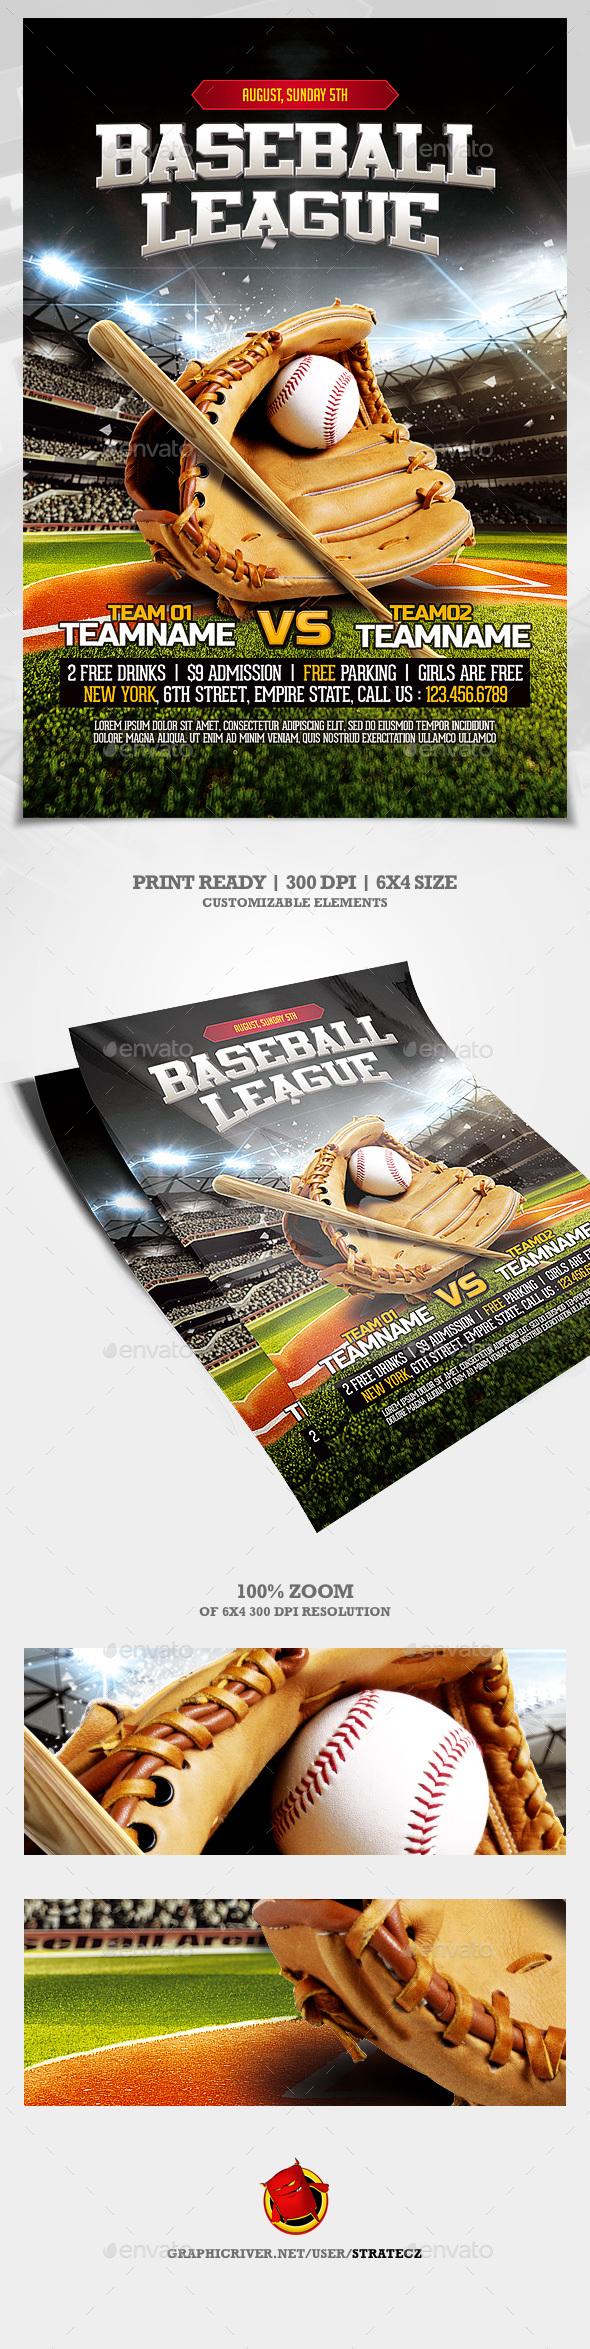 Baseball League Flyer - Print Templates